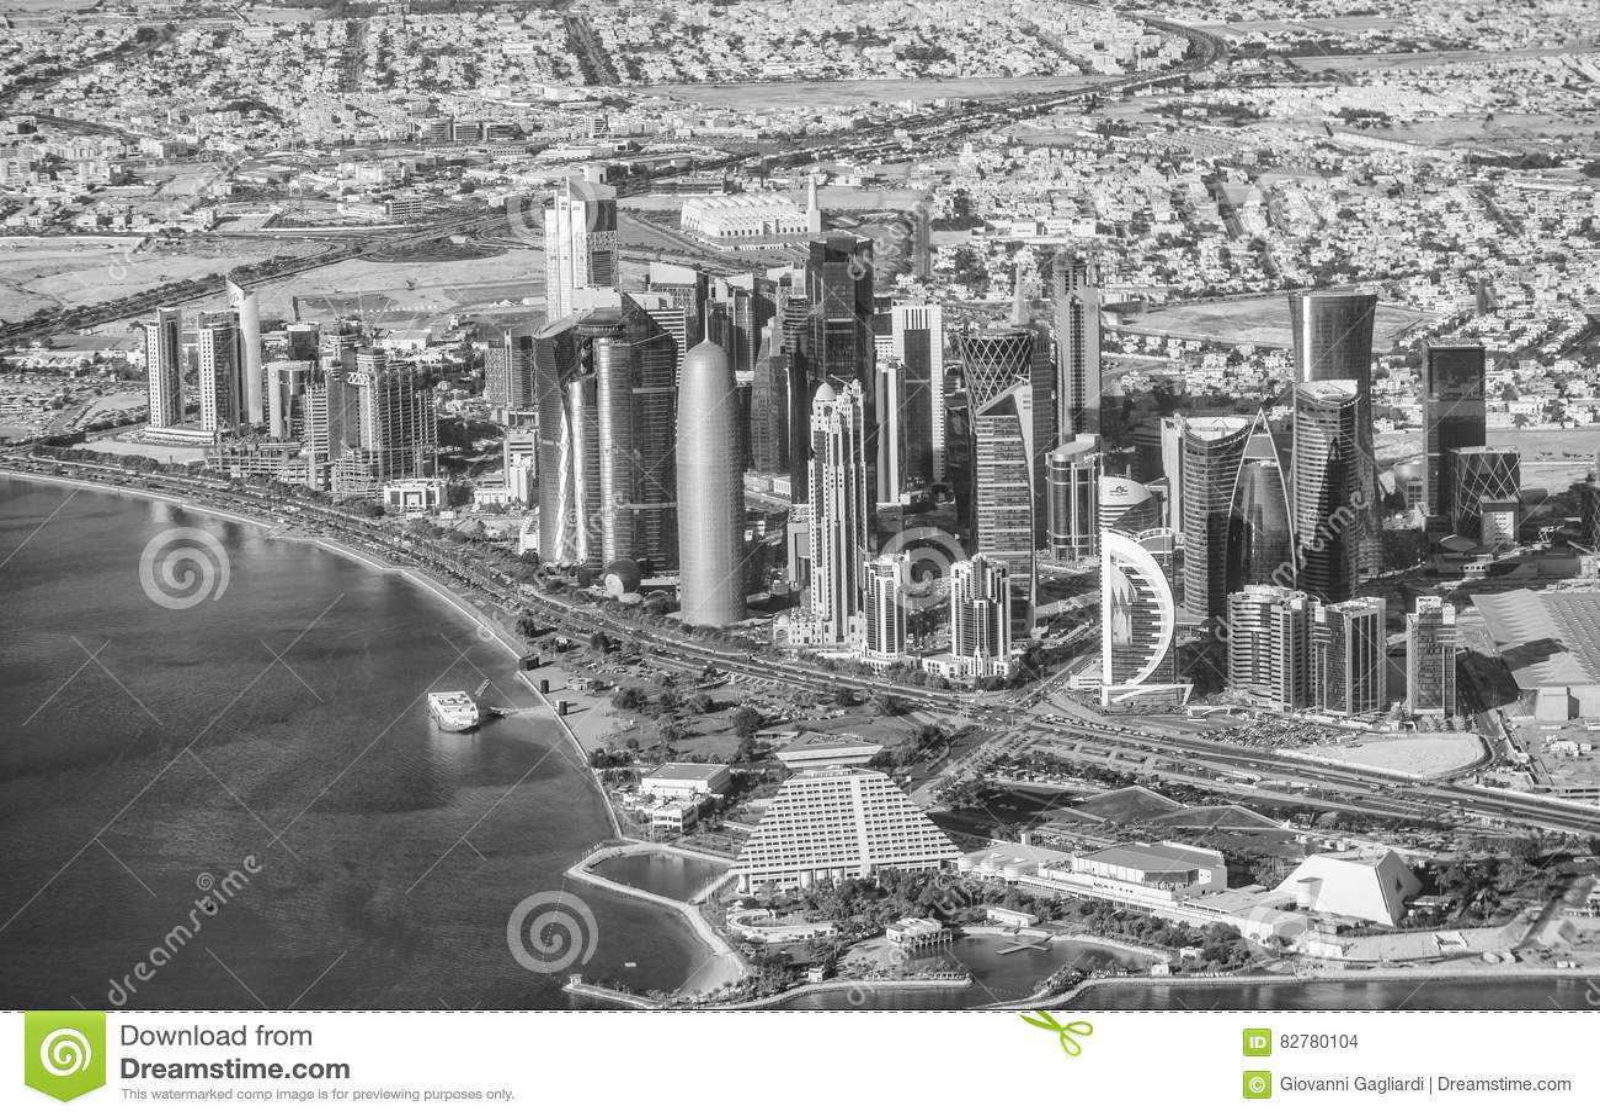 DOHA, QATAR - DECEMBER 12, 2016: Aerial View Of City Skyline